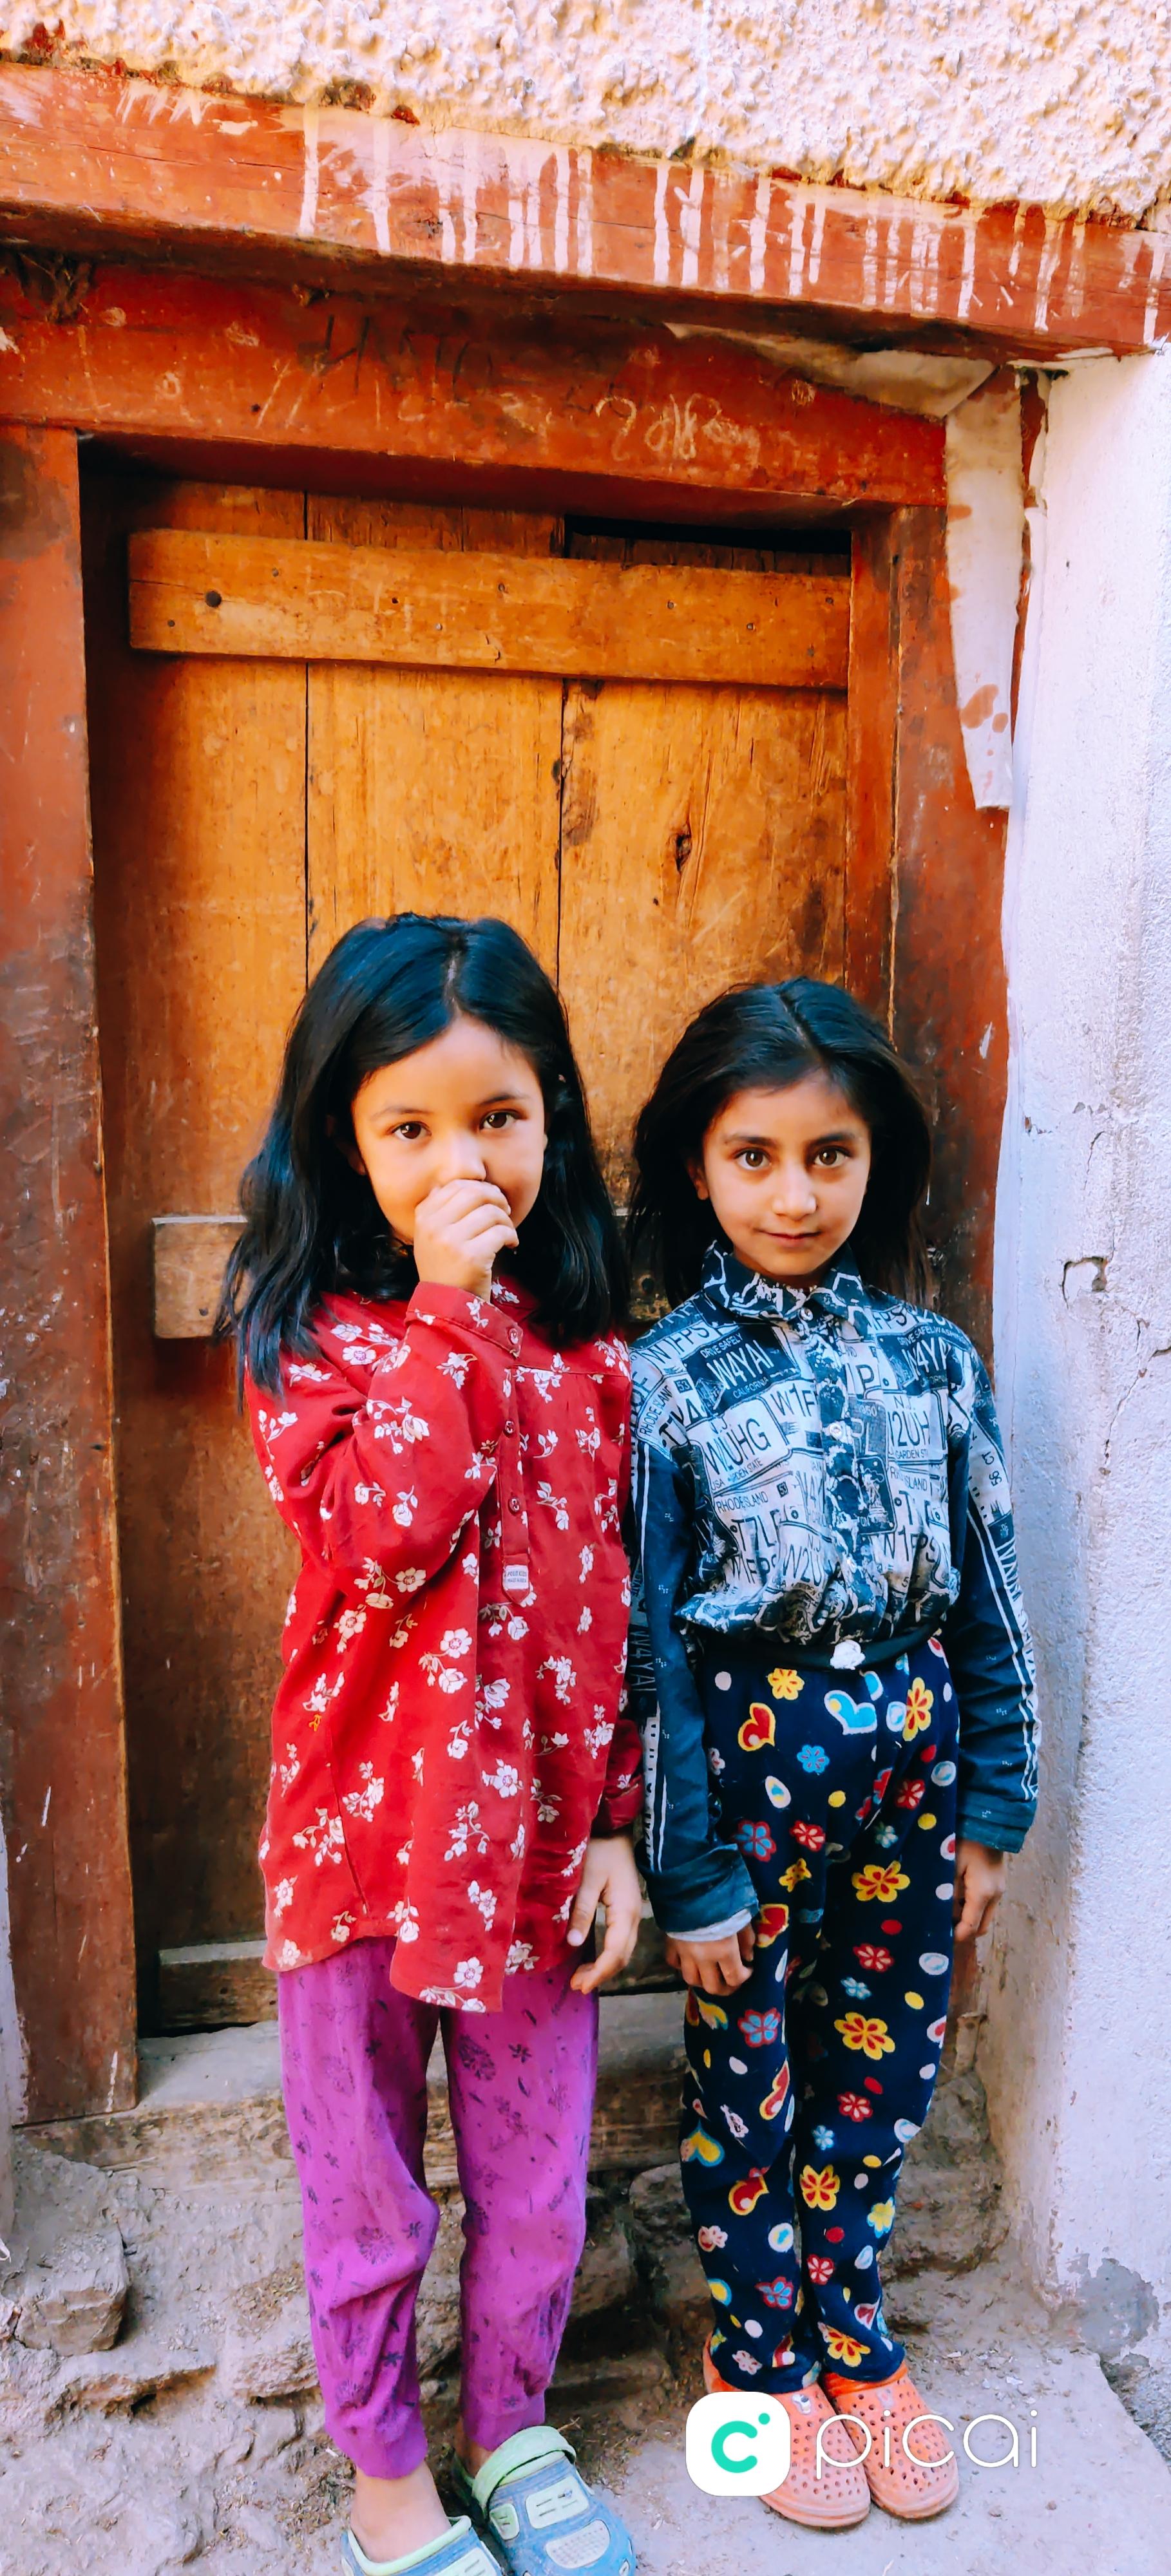 Aryan race of Ladakh